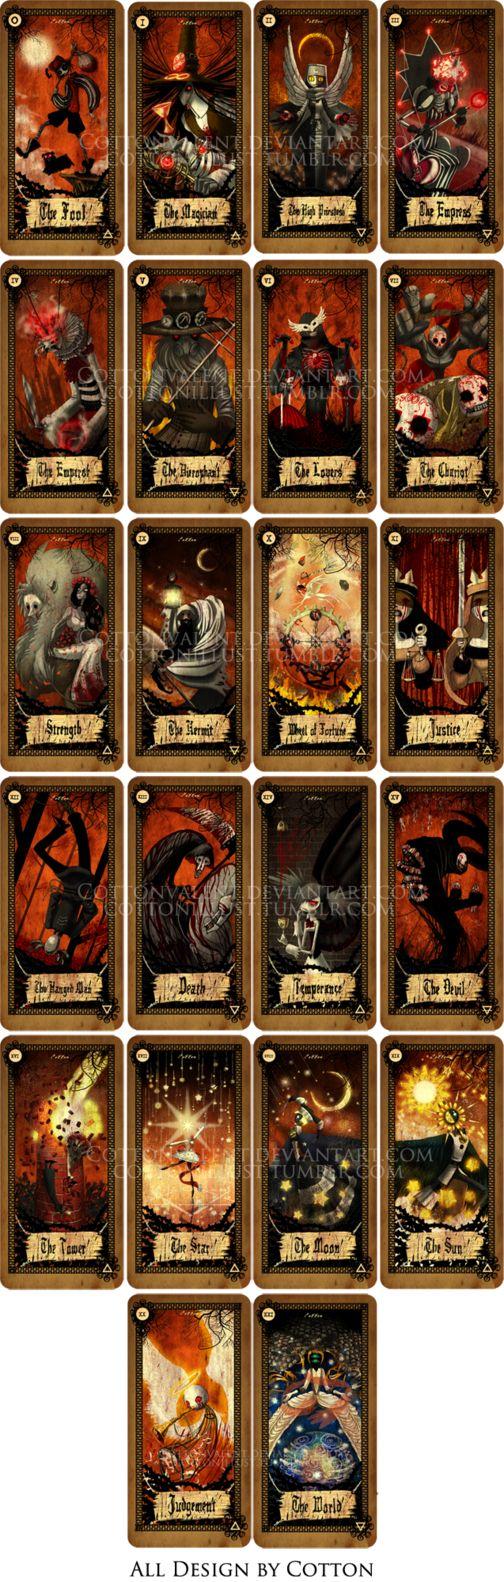 Beautiful taro cards by CottonValent on DA. Major Arcana, for sale 40.00 a set.